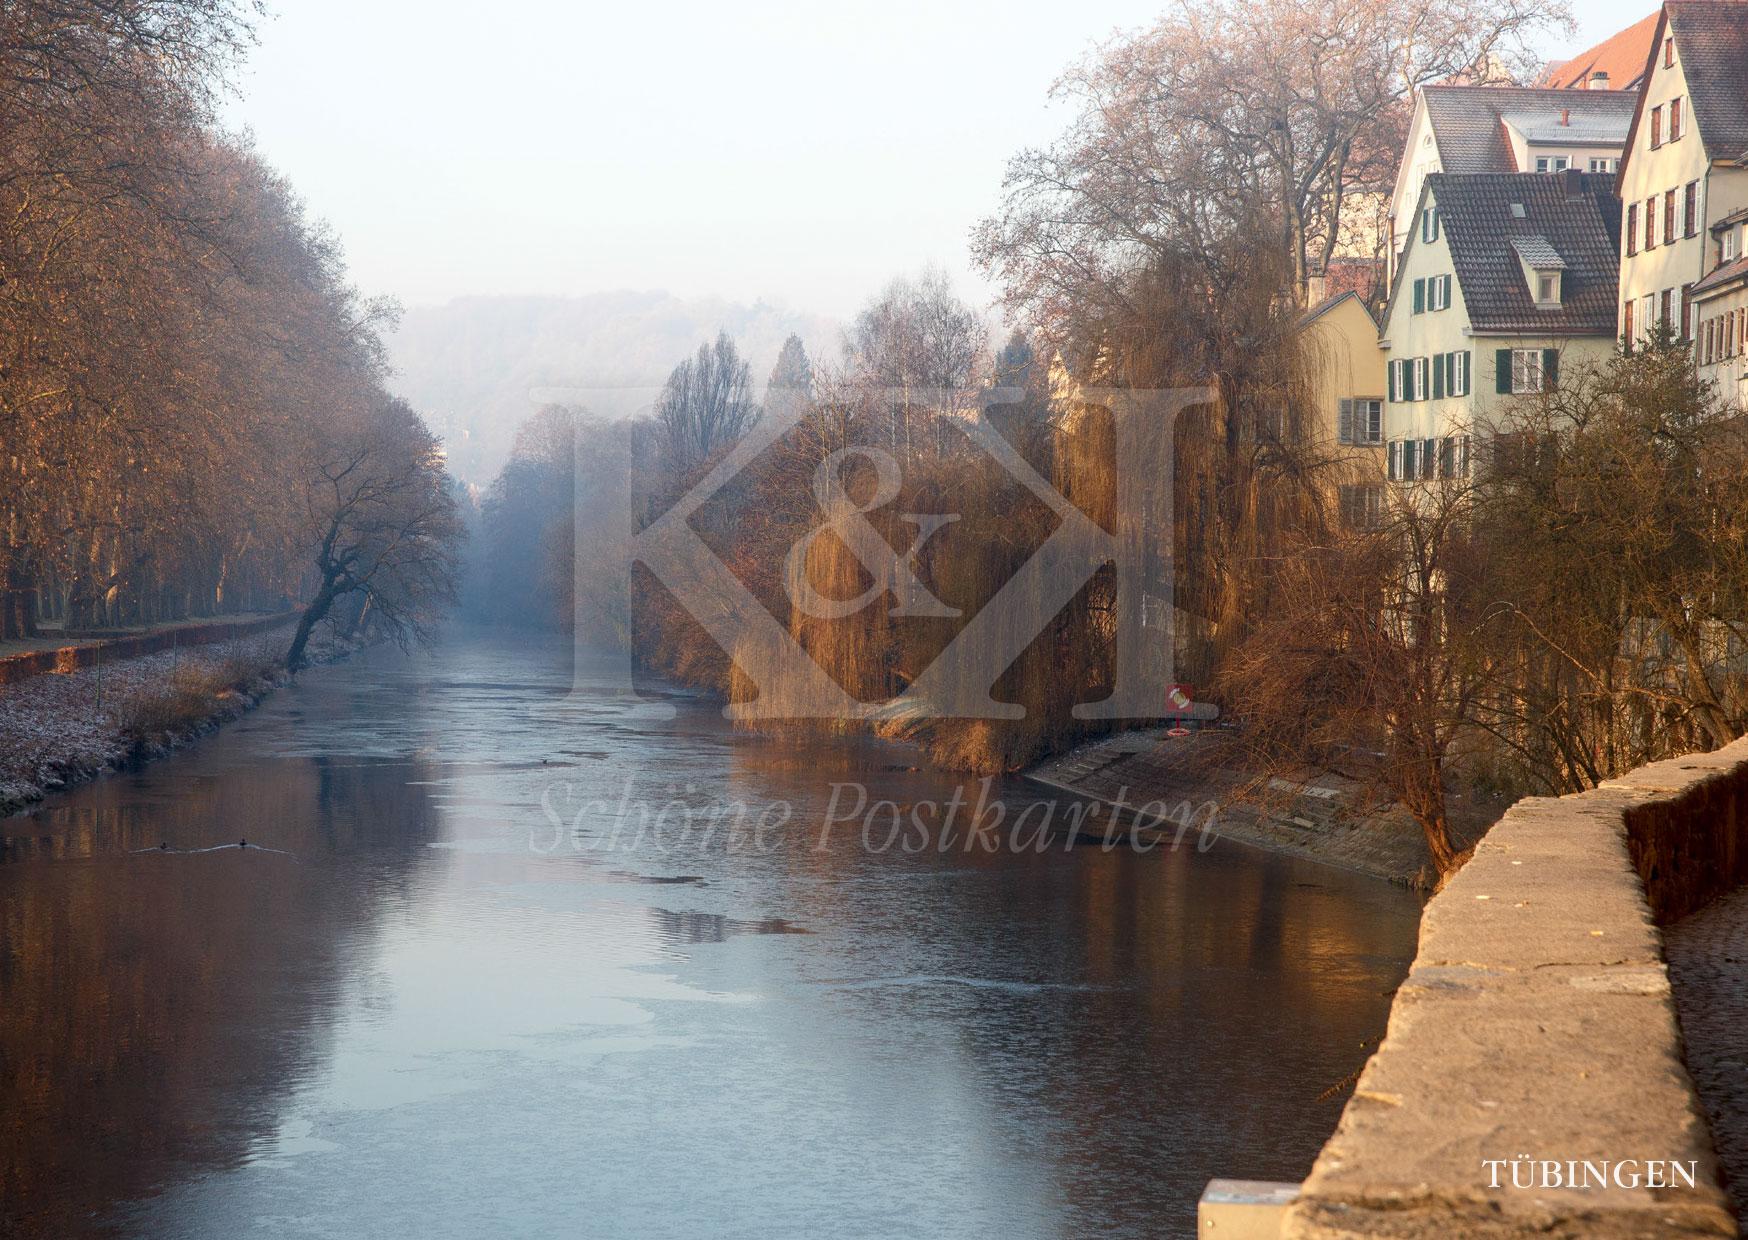 <strong>Schöne Postkarte Nr. 210</strong> · Tübingen, Neckarmauer · © 2017